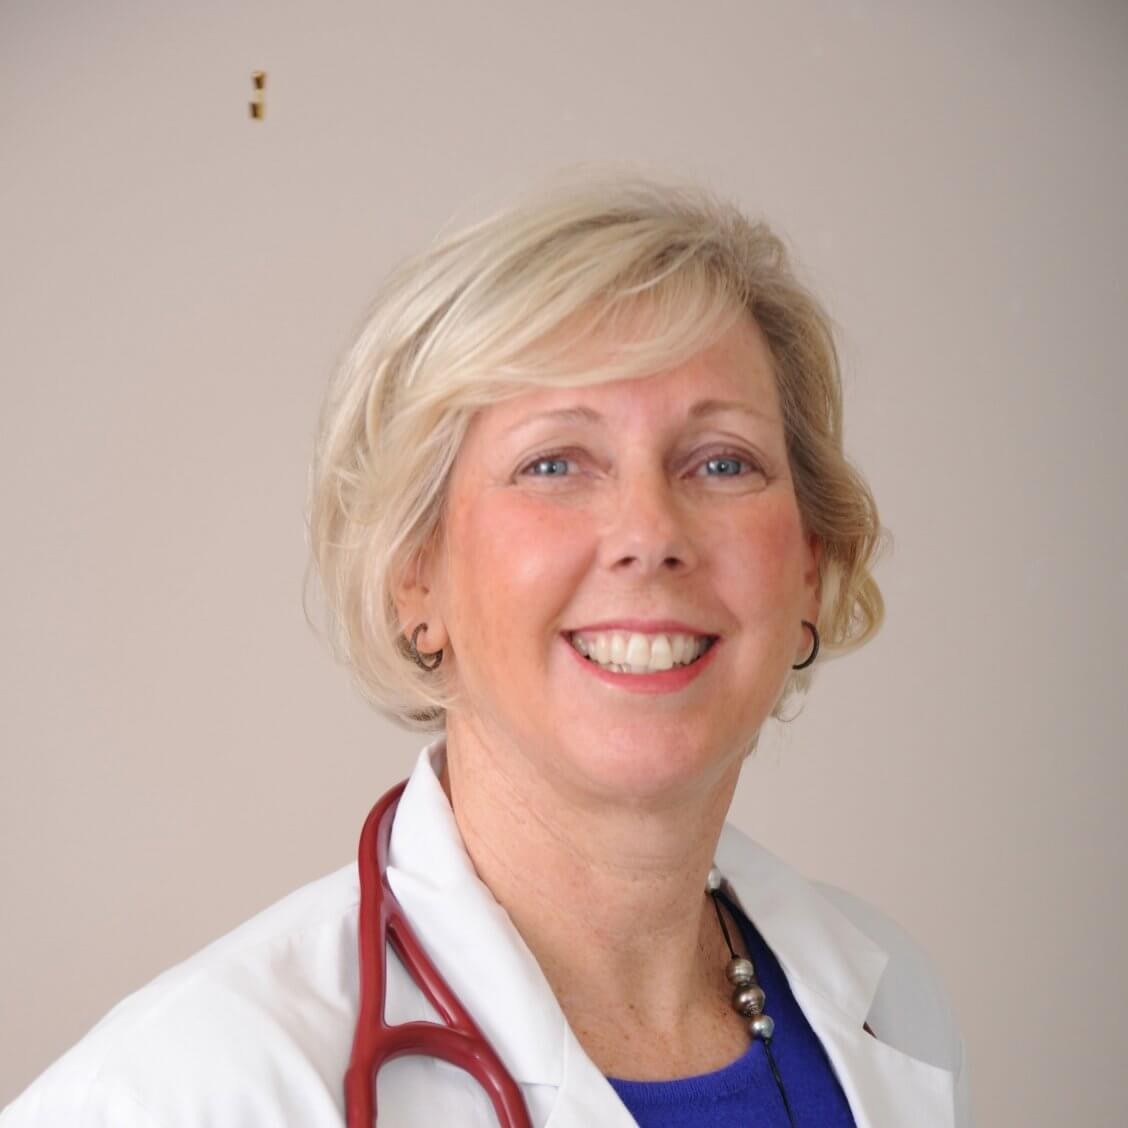 Dr. Shea of Glenville Medical Concierge Care